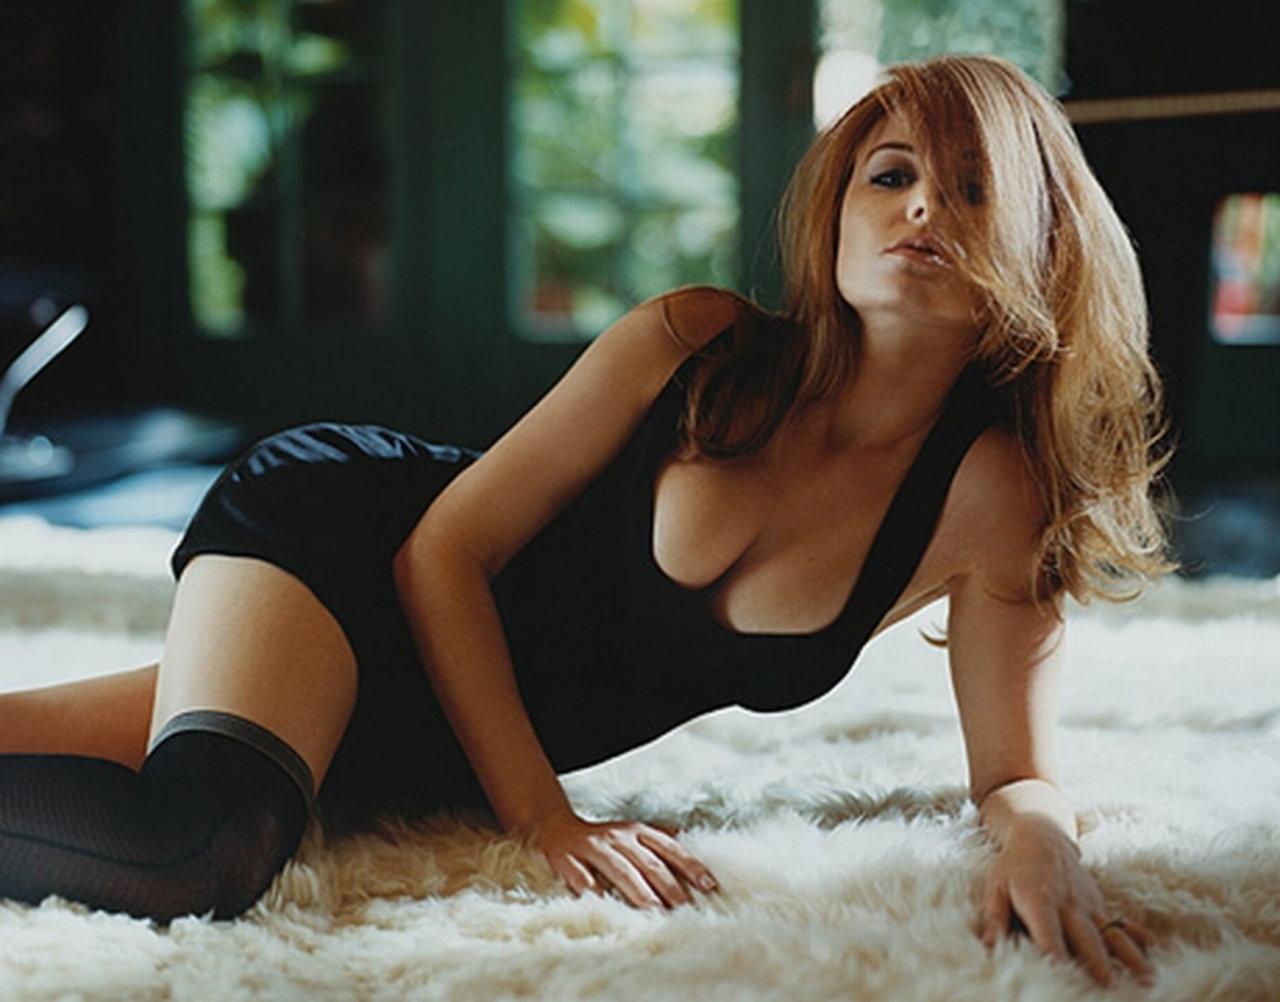 Sexy Isla Fisher Photos Near-Nude Isla